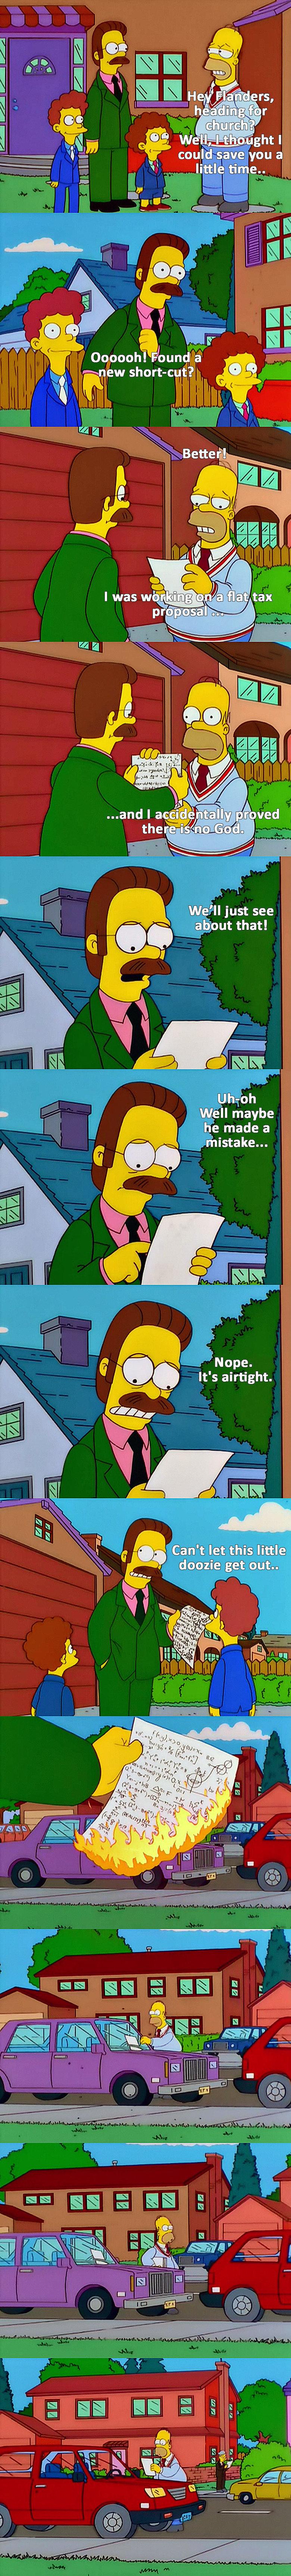 Homer Disproves God. Season 12, Episode 9. Because Skinner and Homer's necks deserve a break... but hes personally met God... several times